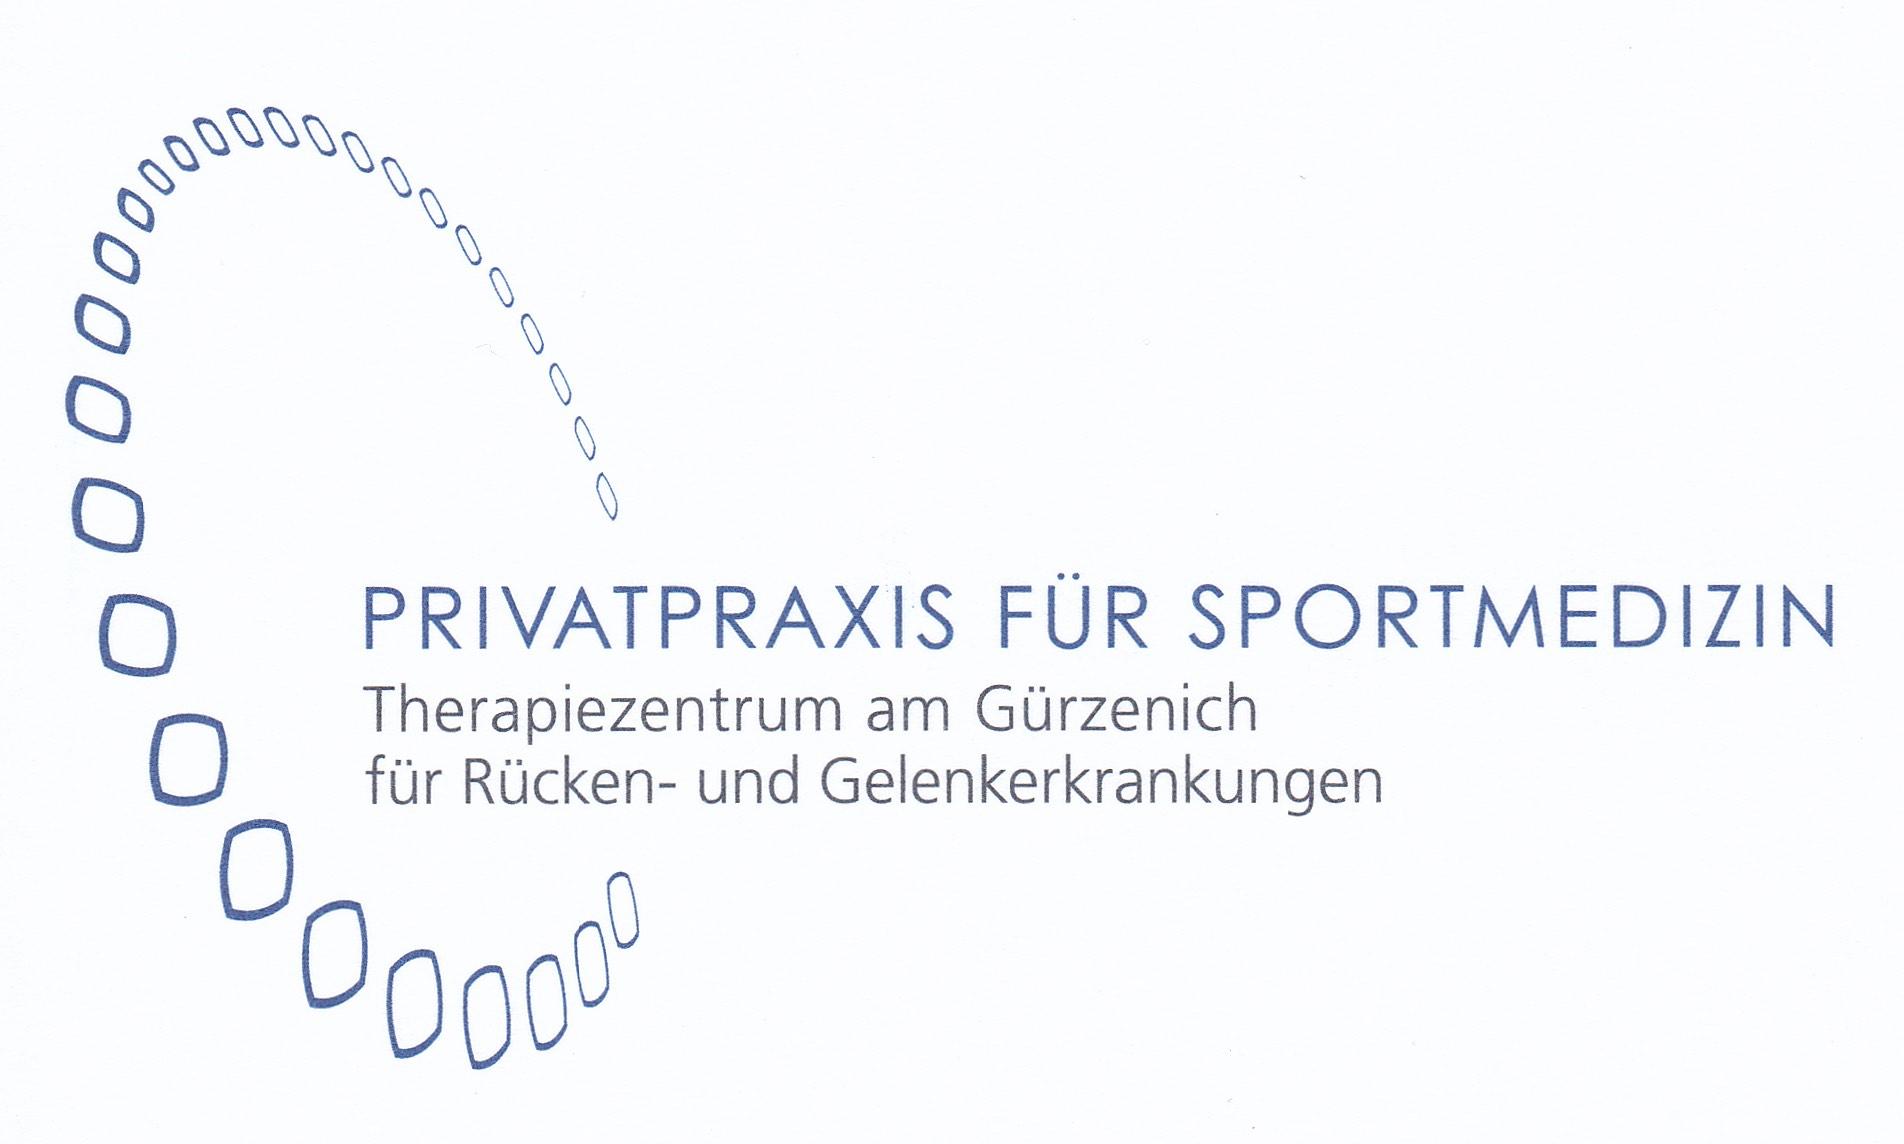 Privatpraxis für Sportmedizin